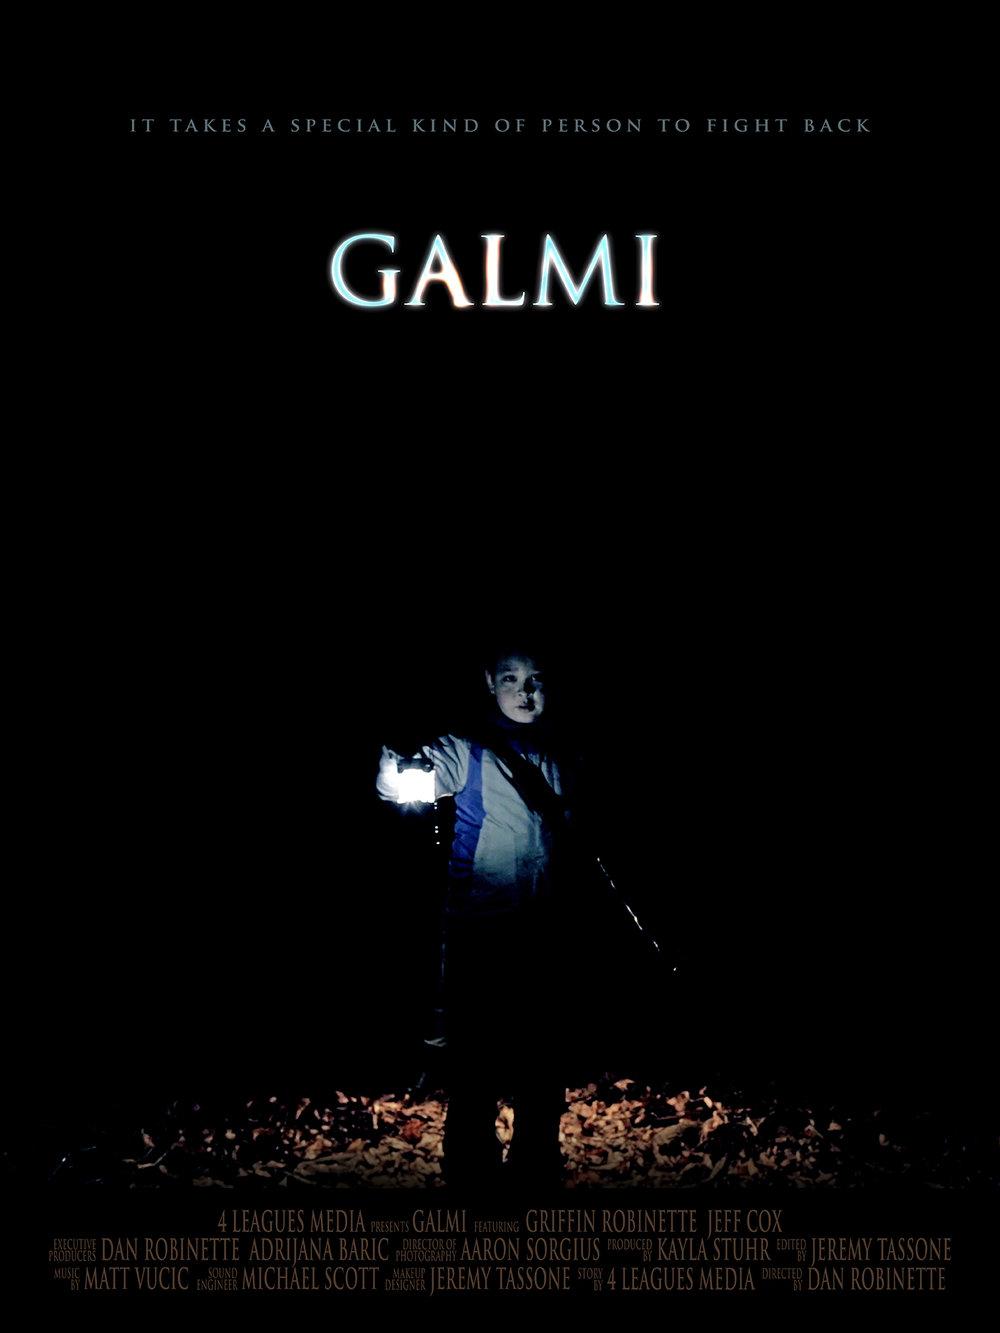 Galmi_Poster_V1B_18x24.JPG